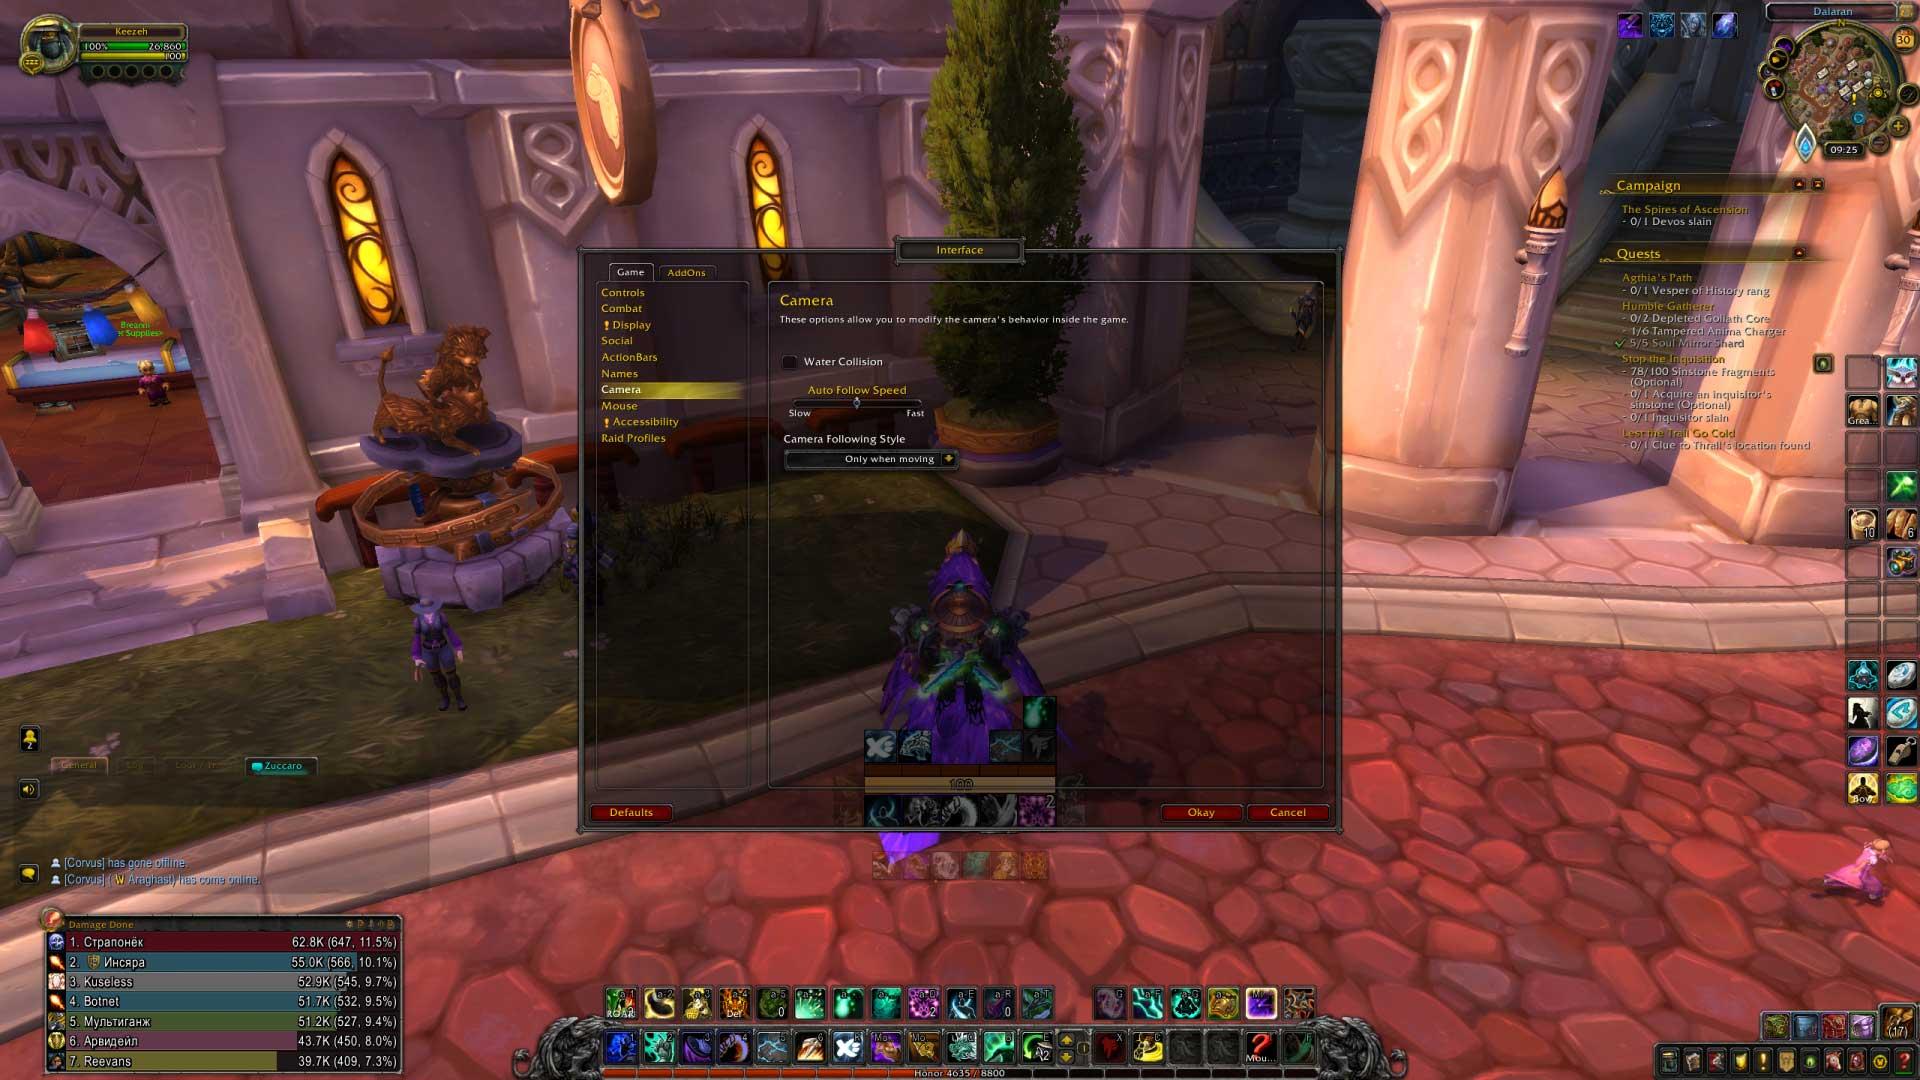 World-of-Warcraft-Ustawienia-interfejsu-5